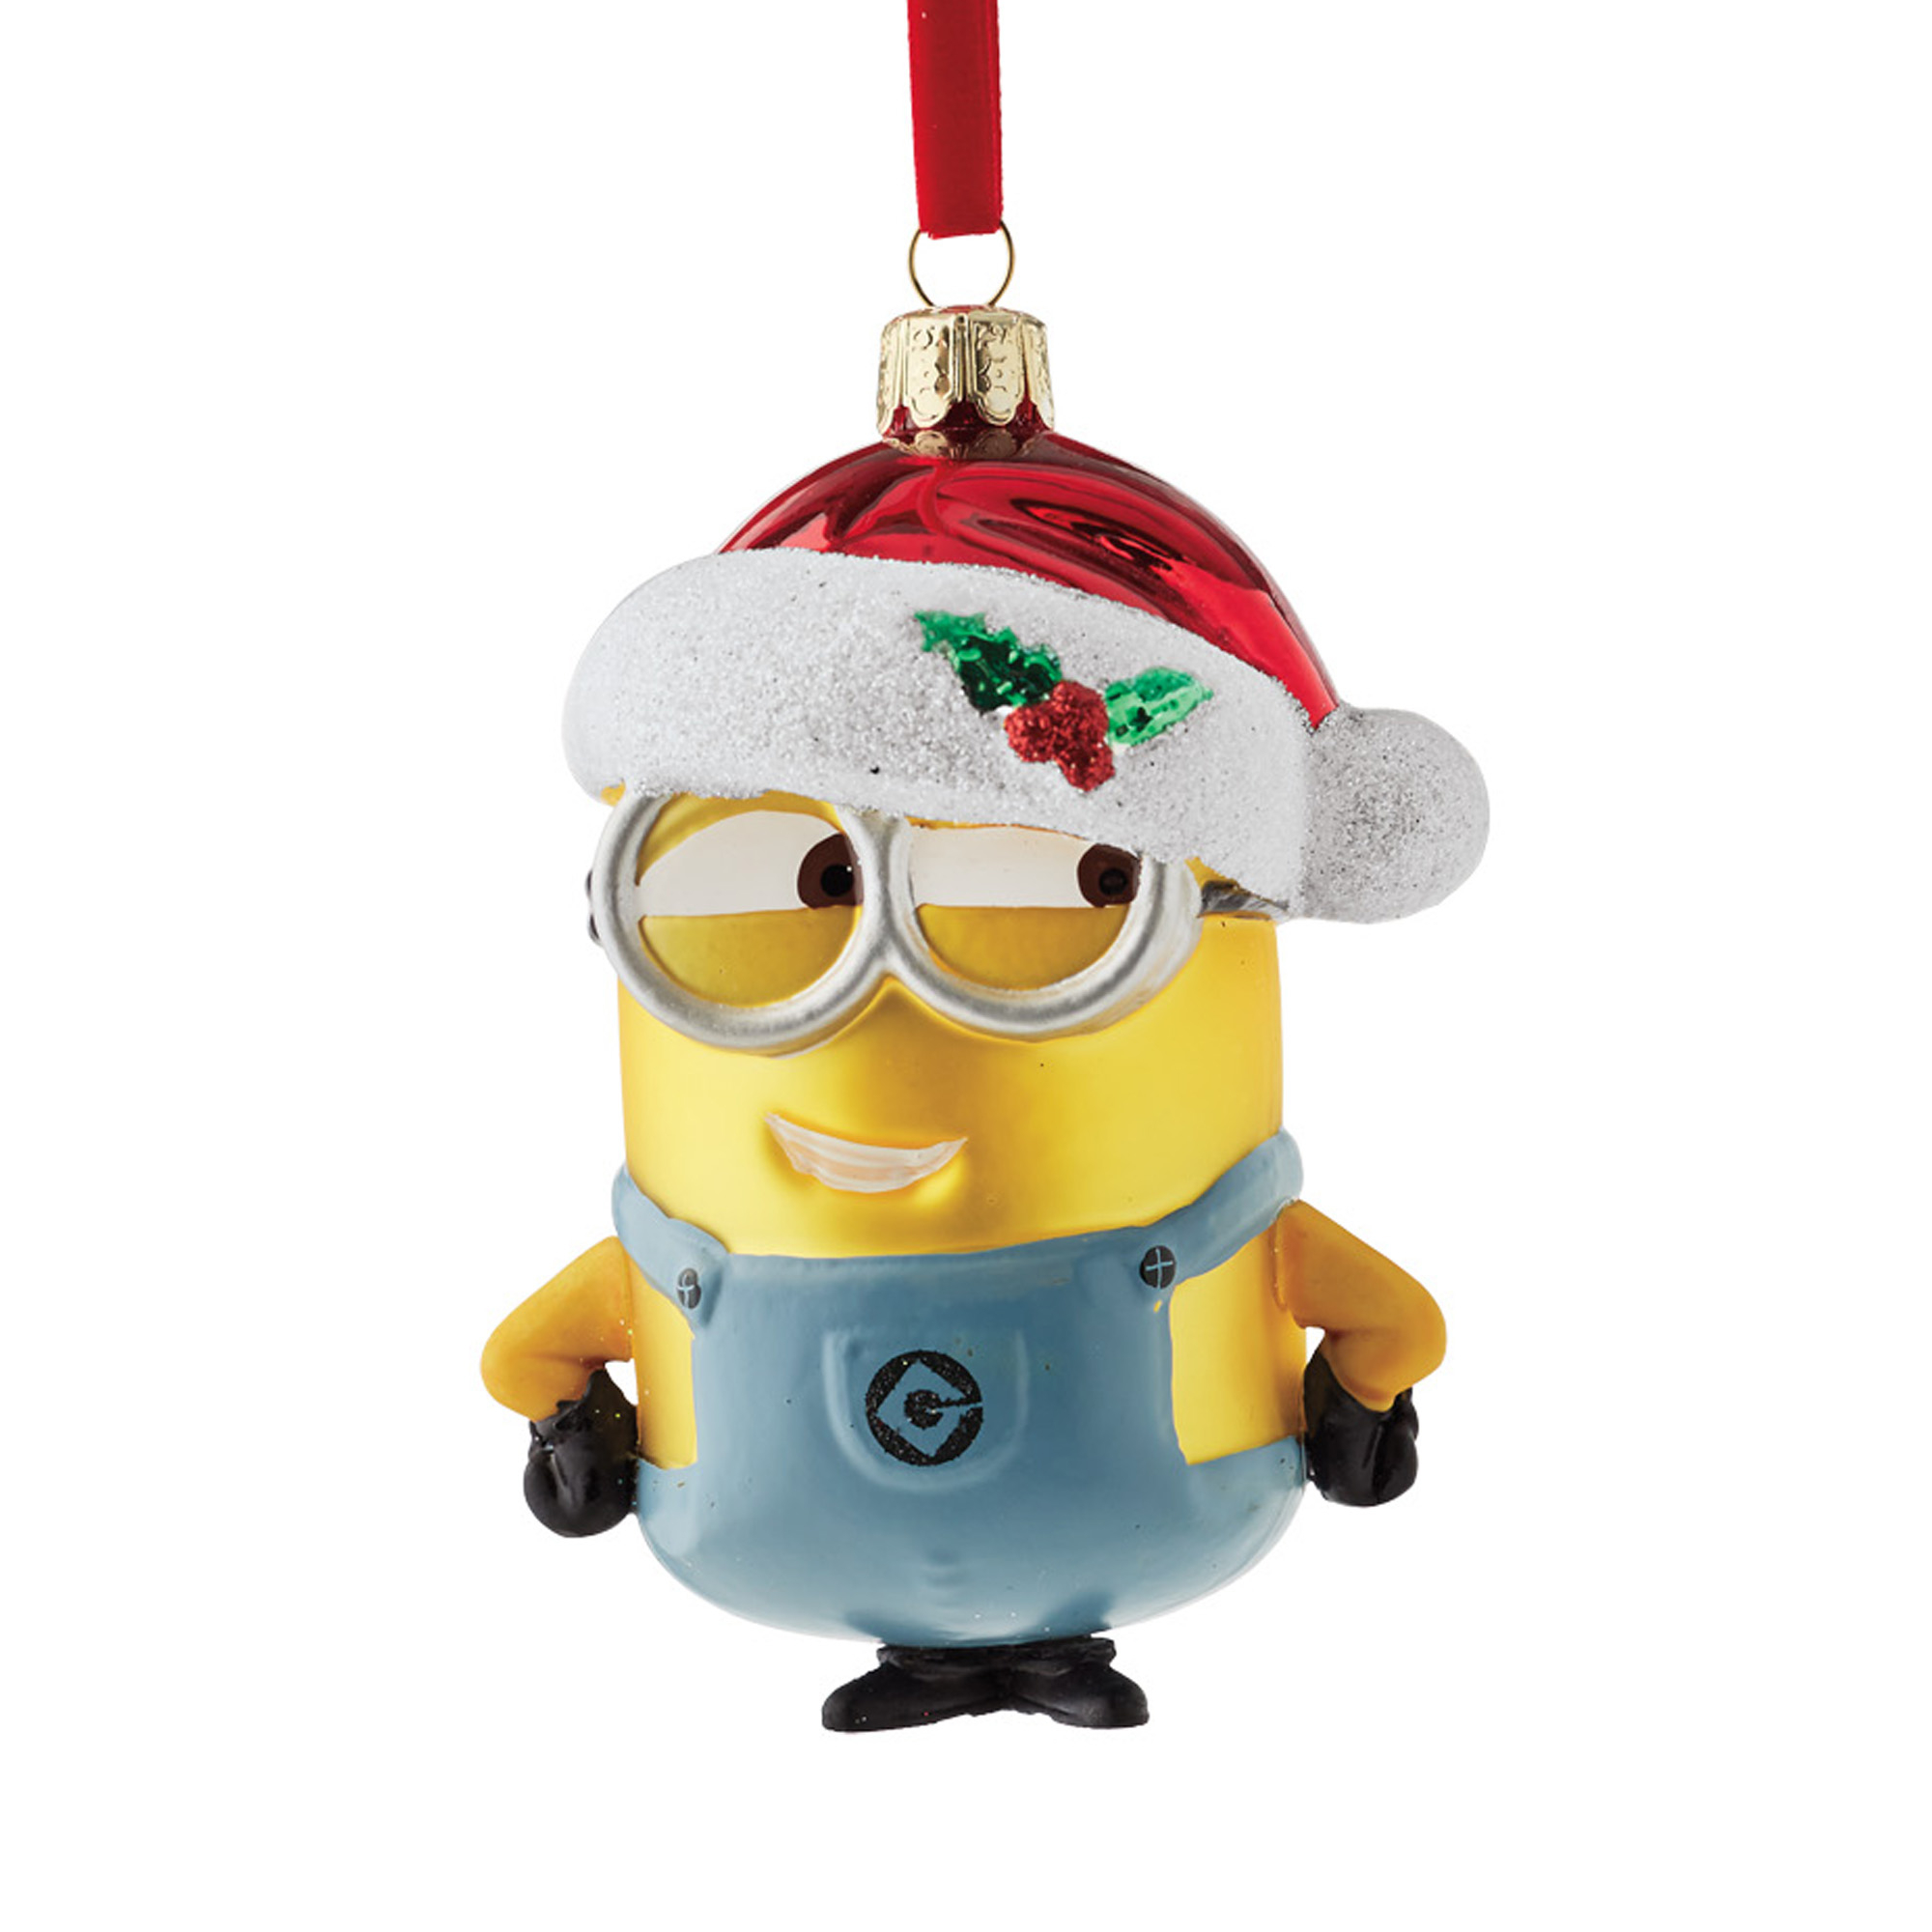 The Minions Christmas Ornament | Gump\'s